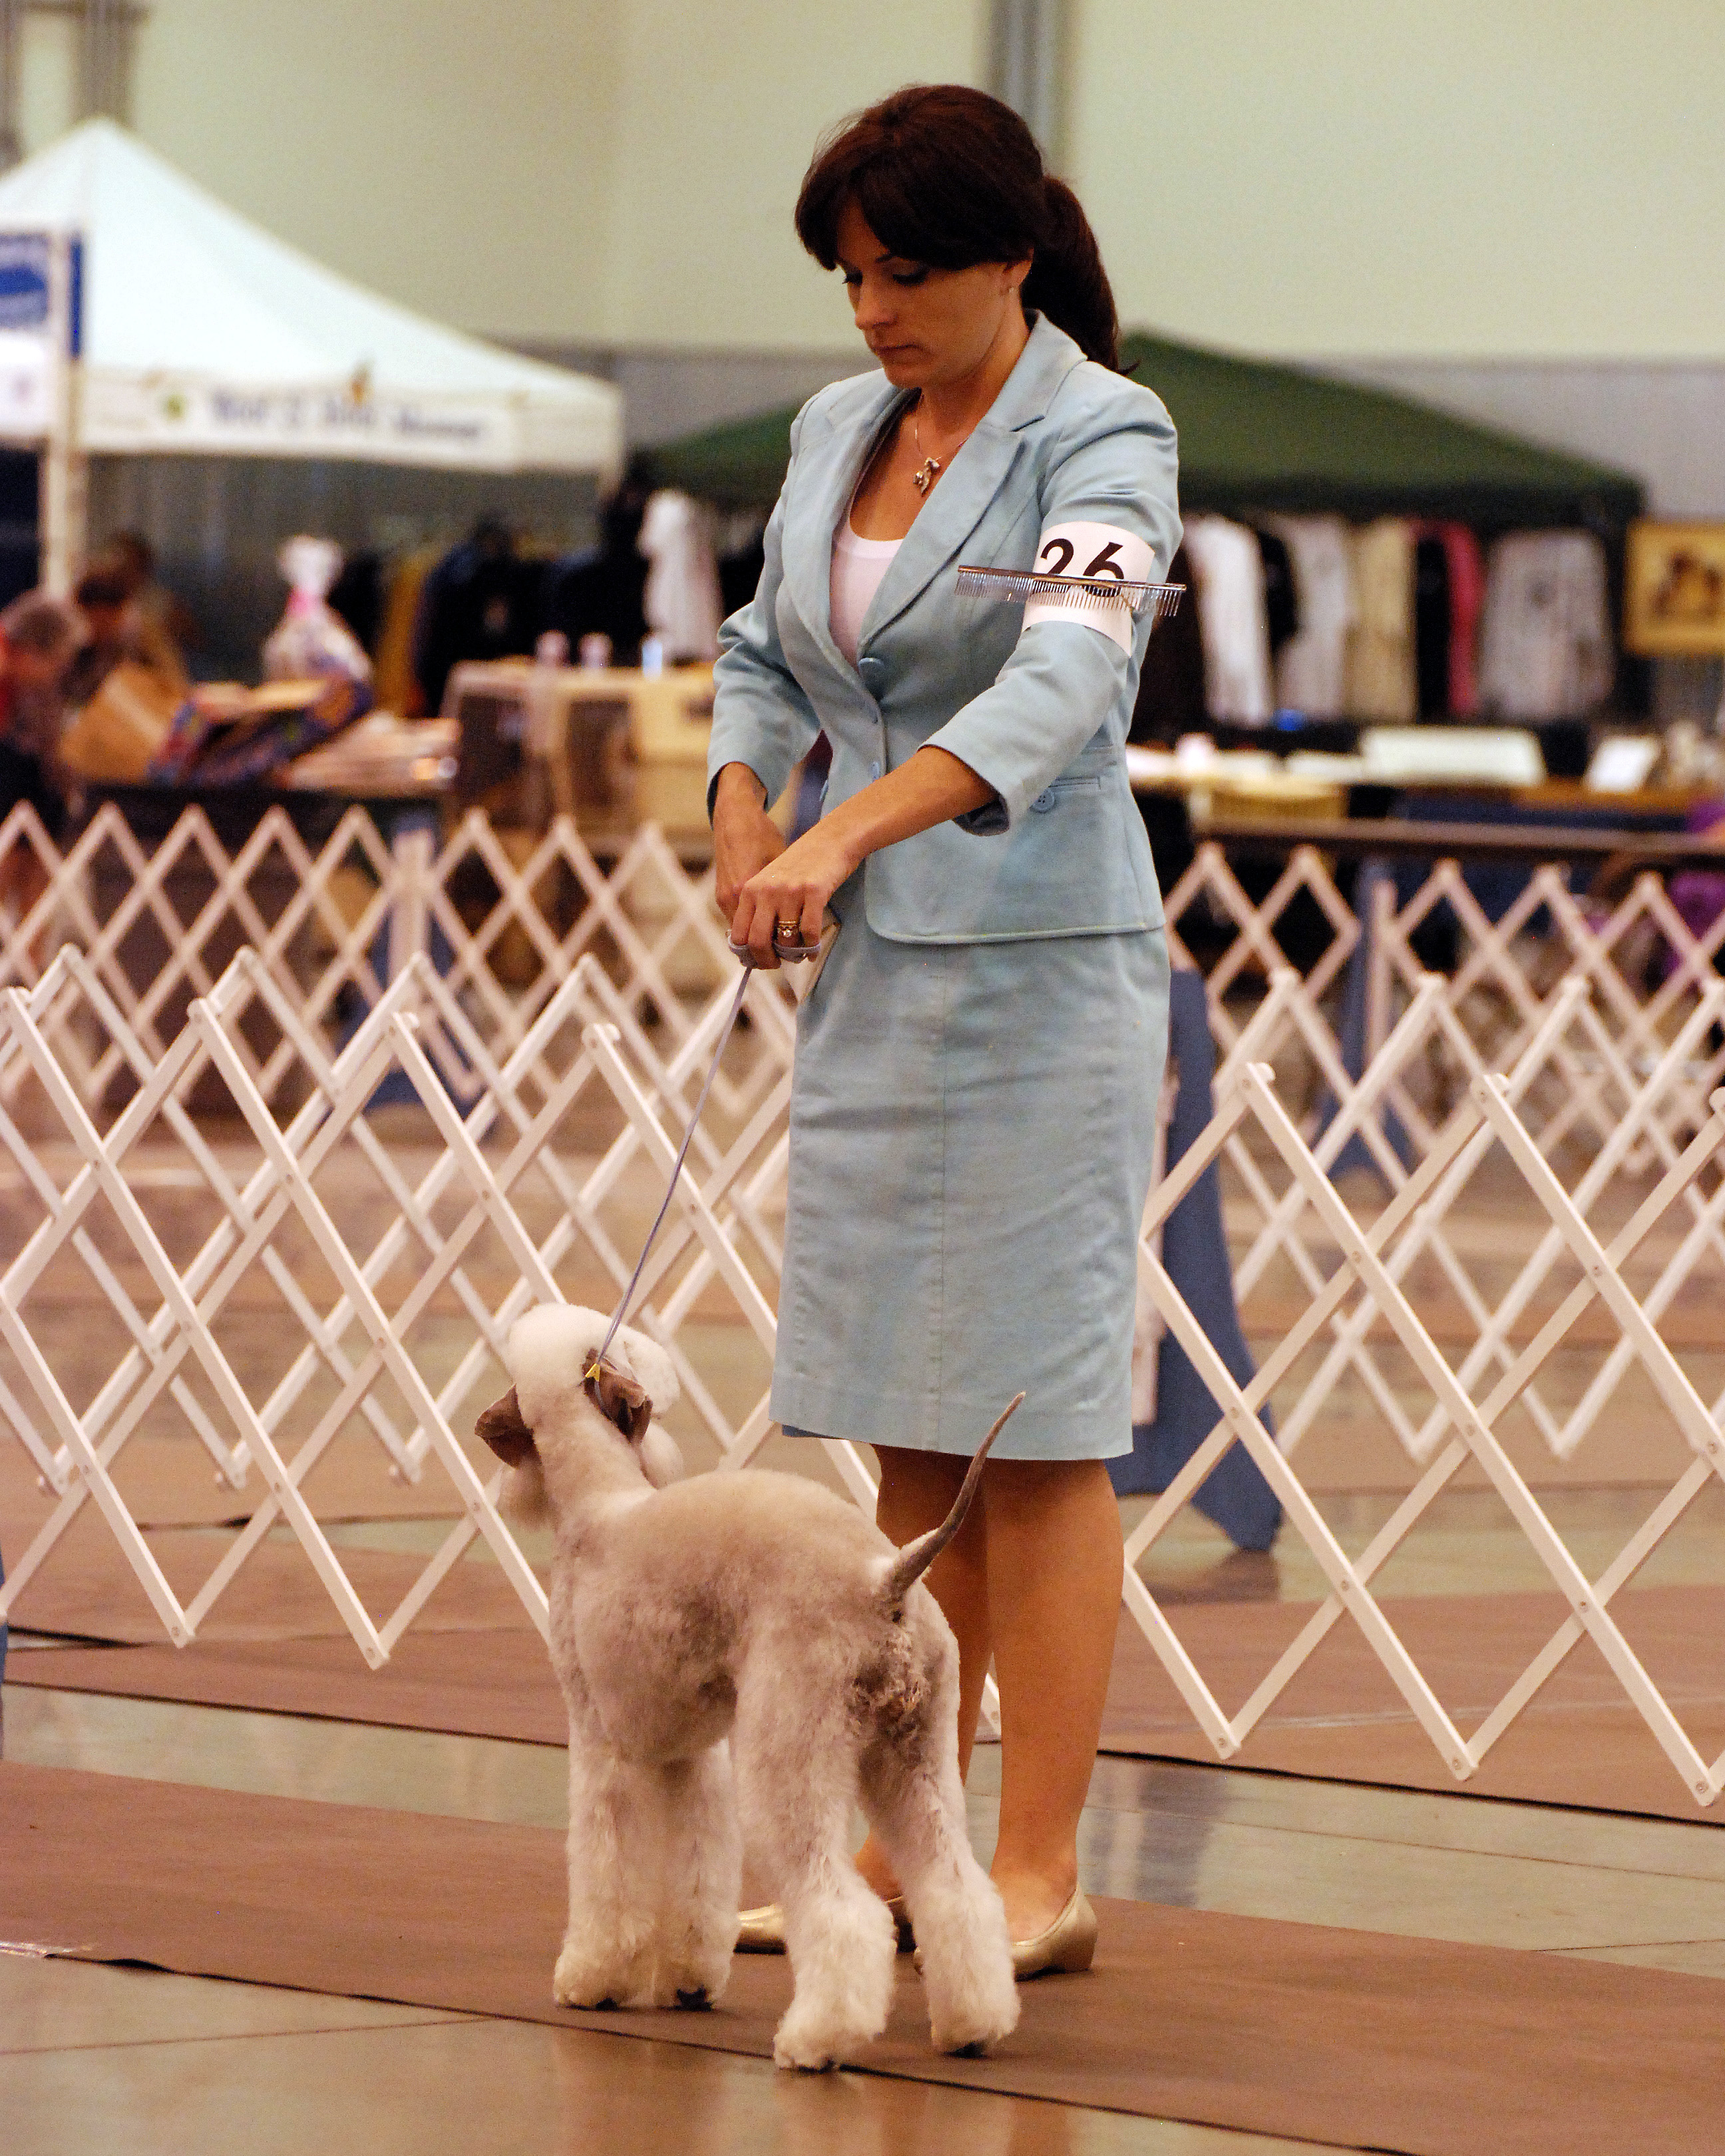 Dog Show Handler Dress Code